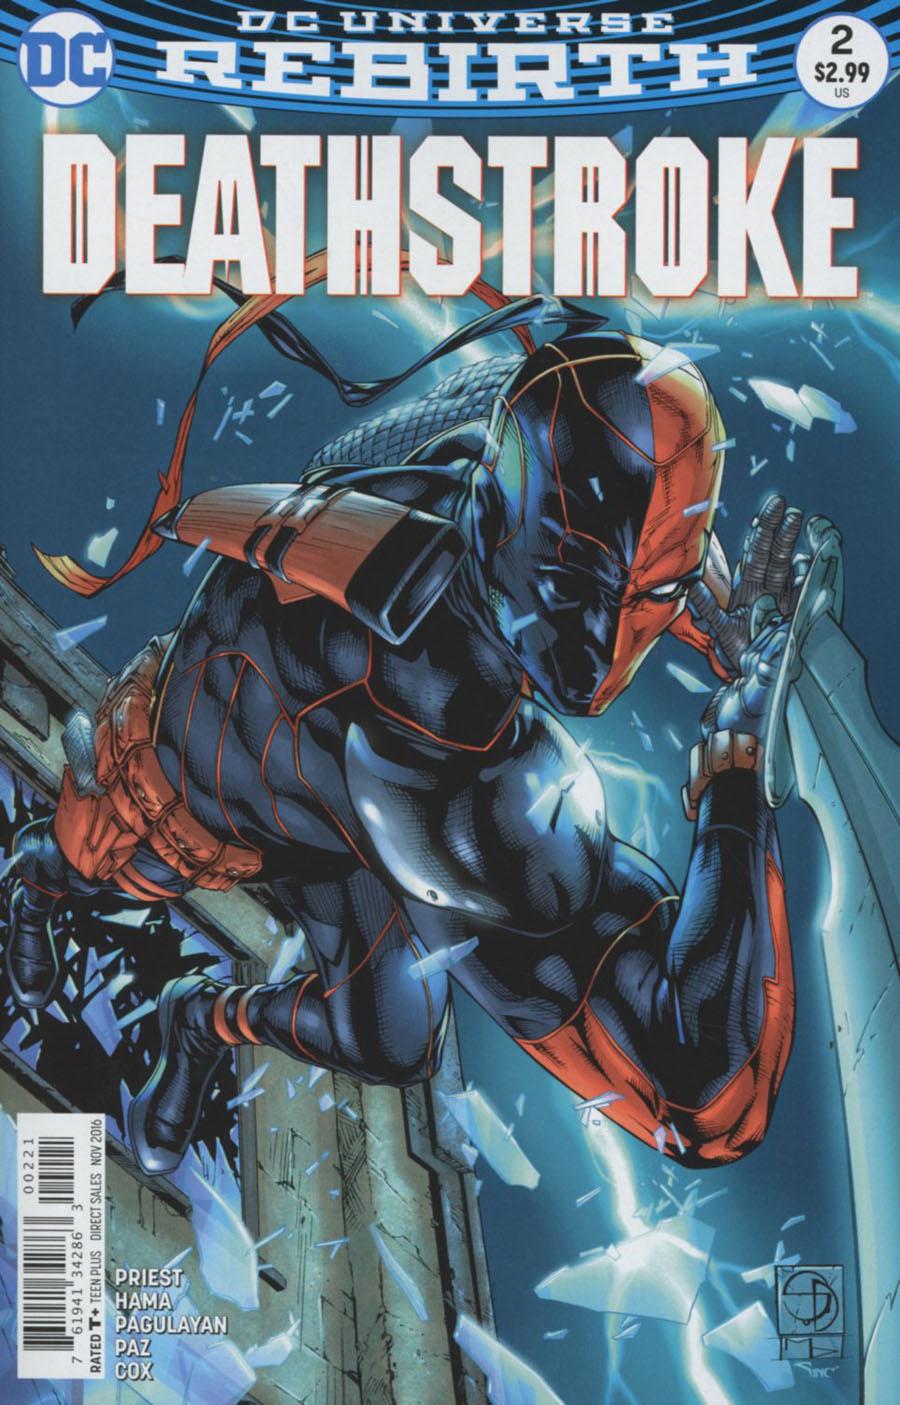 Deathstroke Vol 4 #2 Cover B Variant Shane Davis Cover